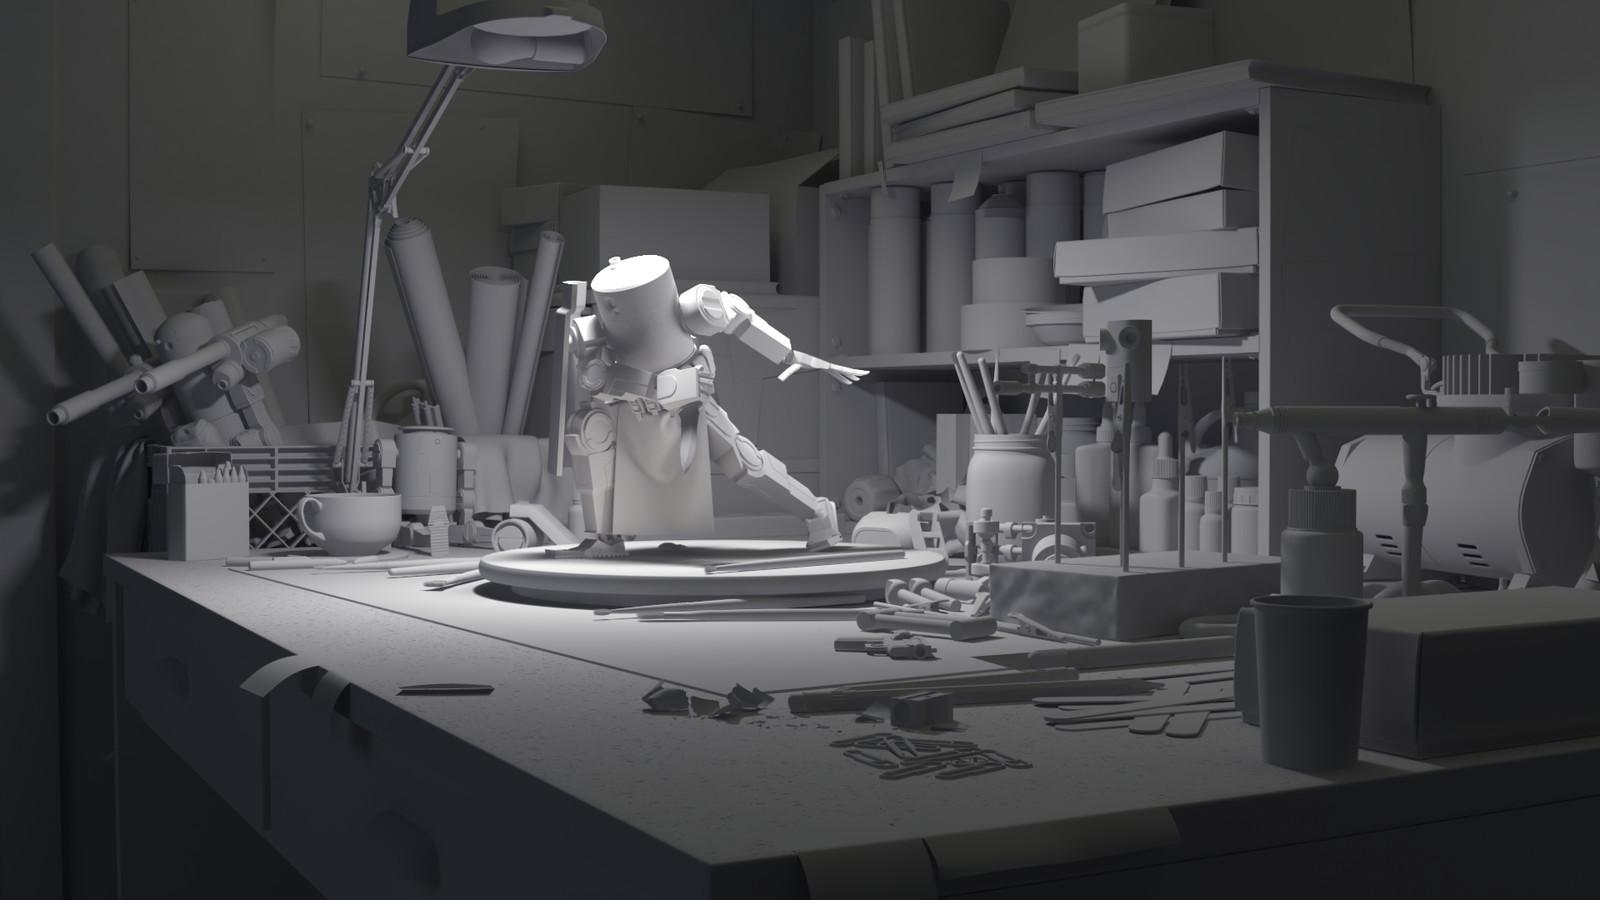 Workbench - 2014 Greyscale